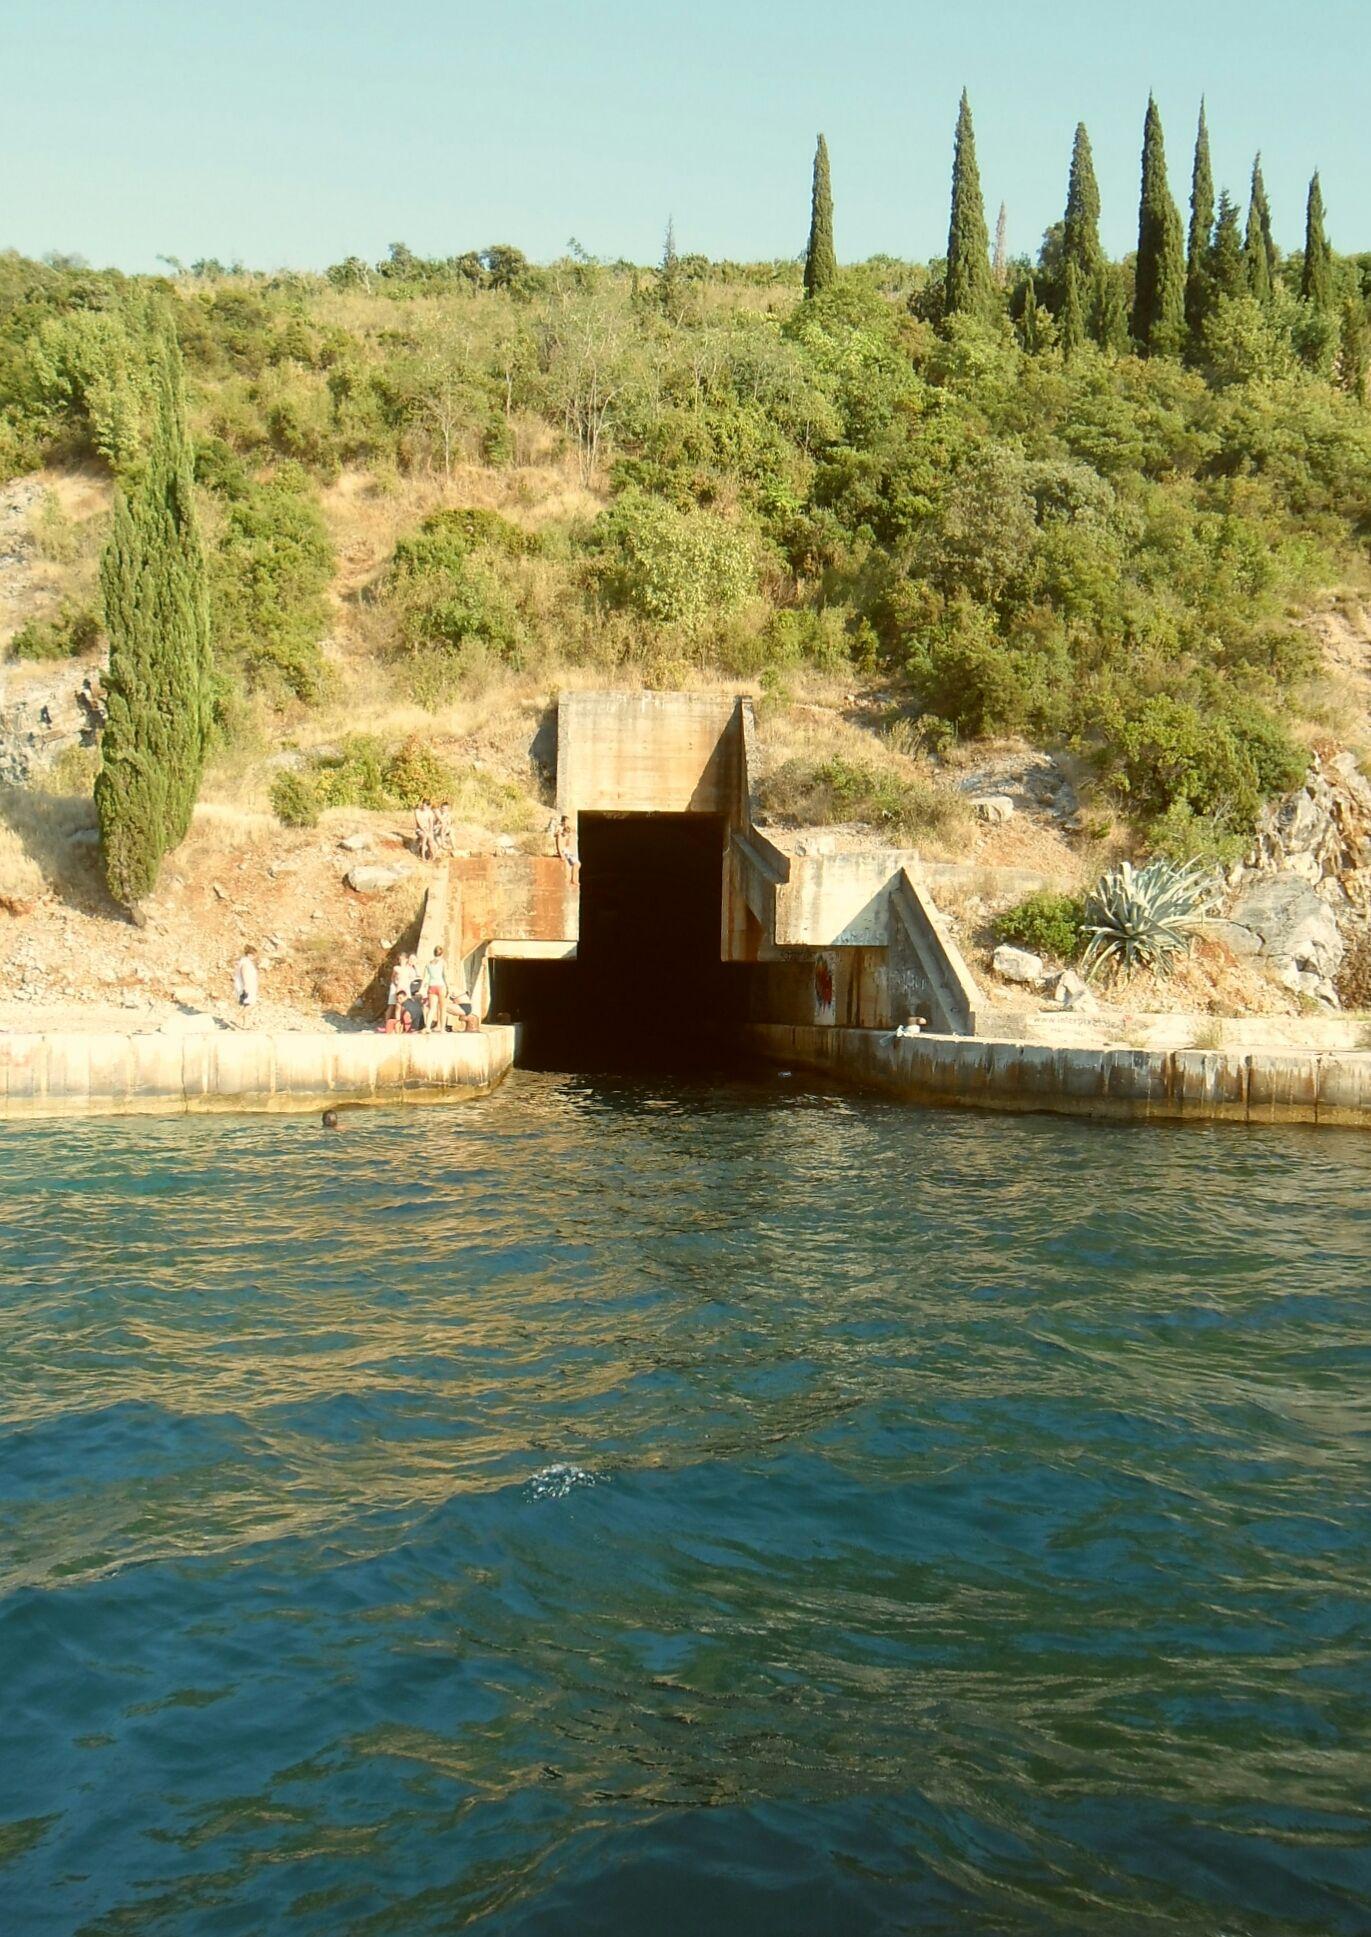 Abandoned submarine base in Boka Kotorska, Montenegro  Note